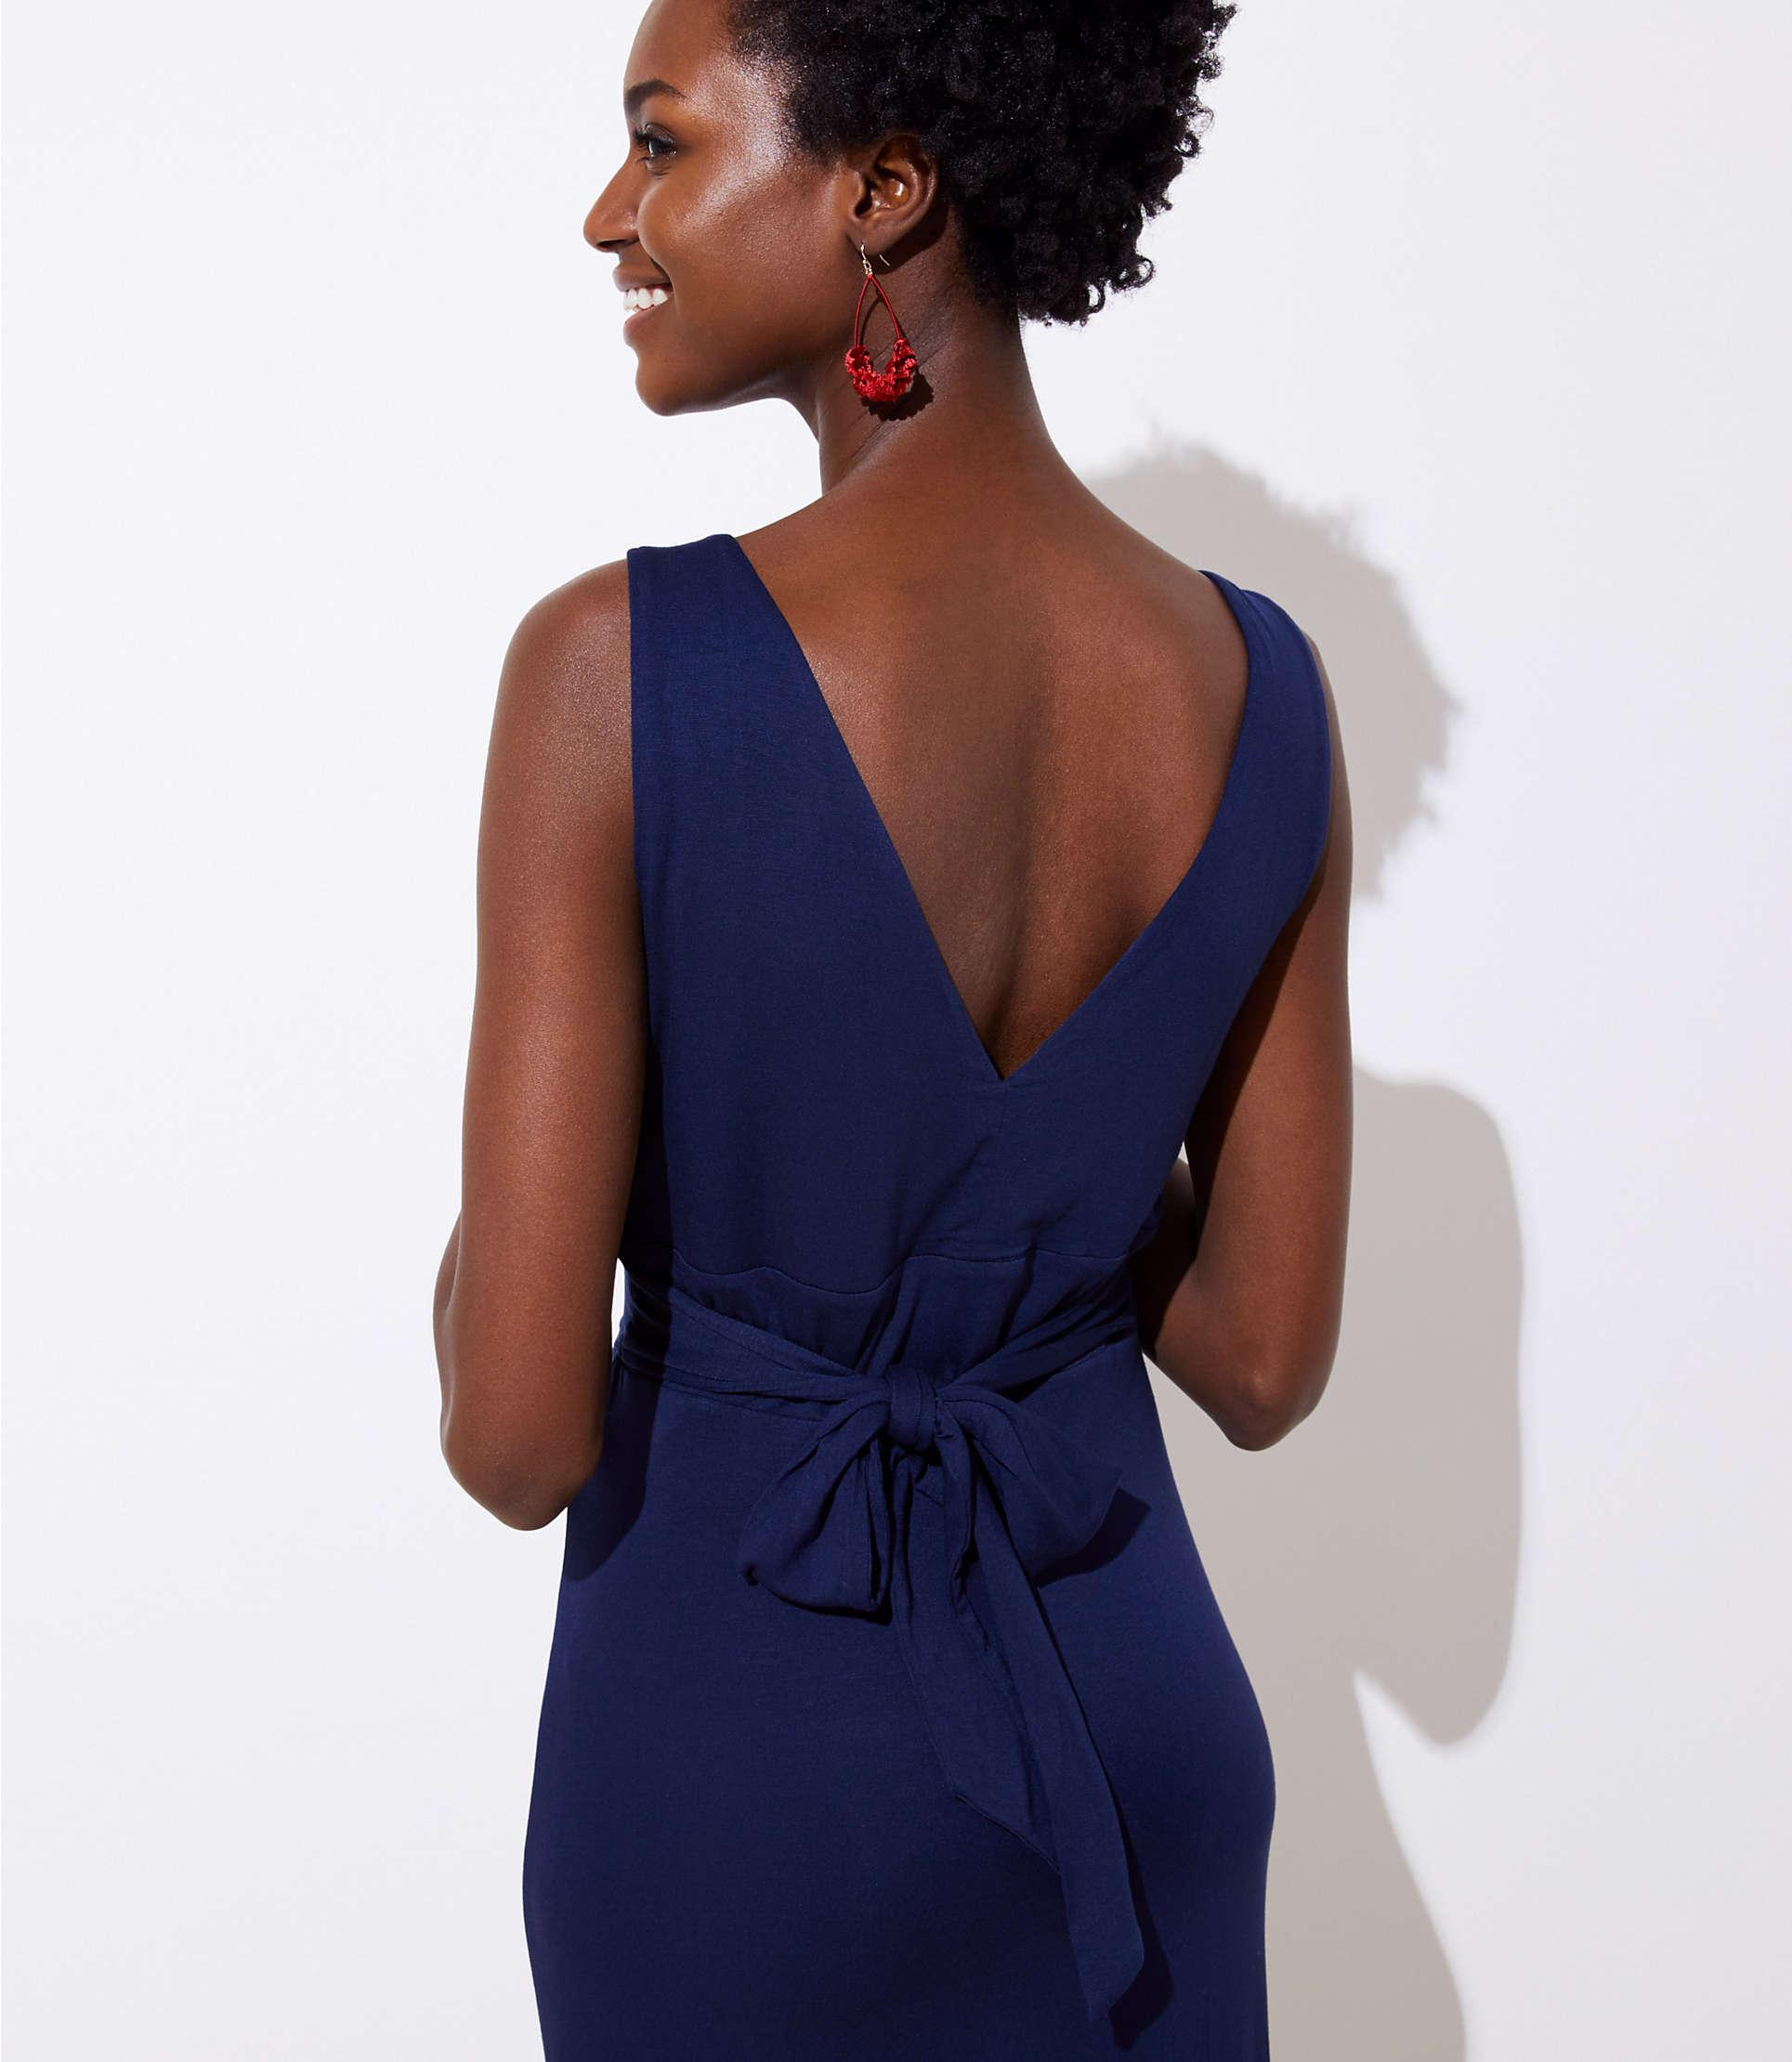 c0221480af7 Lyst - LOFT Petite Tie Waist Maxi Dress in Blue